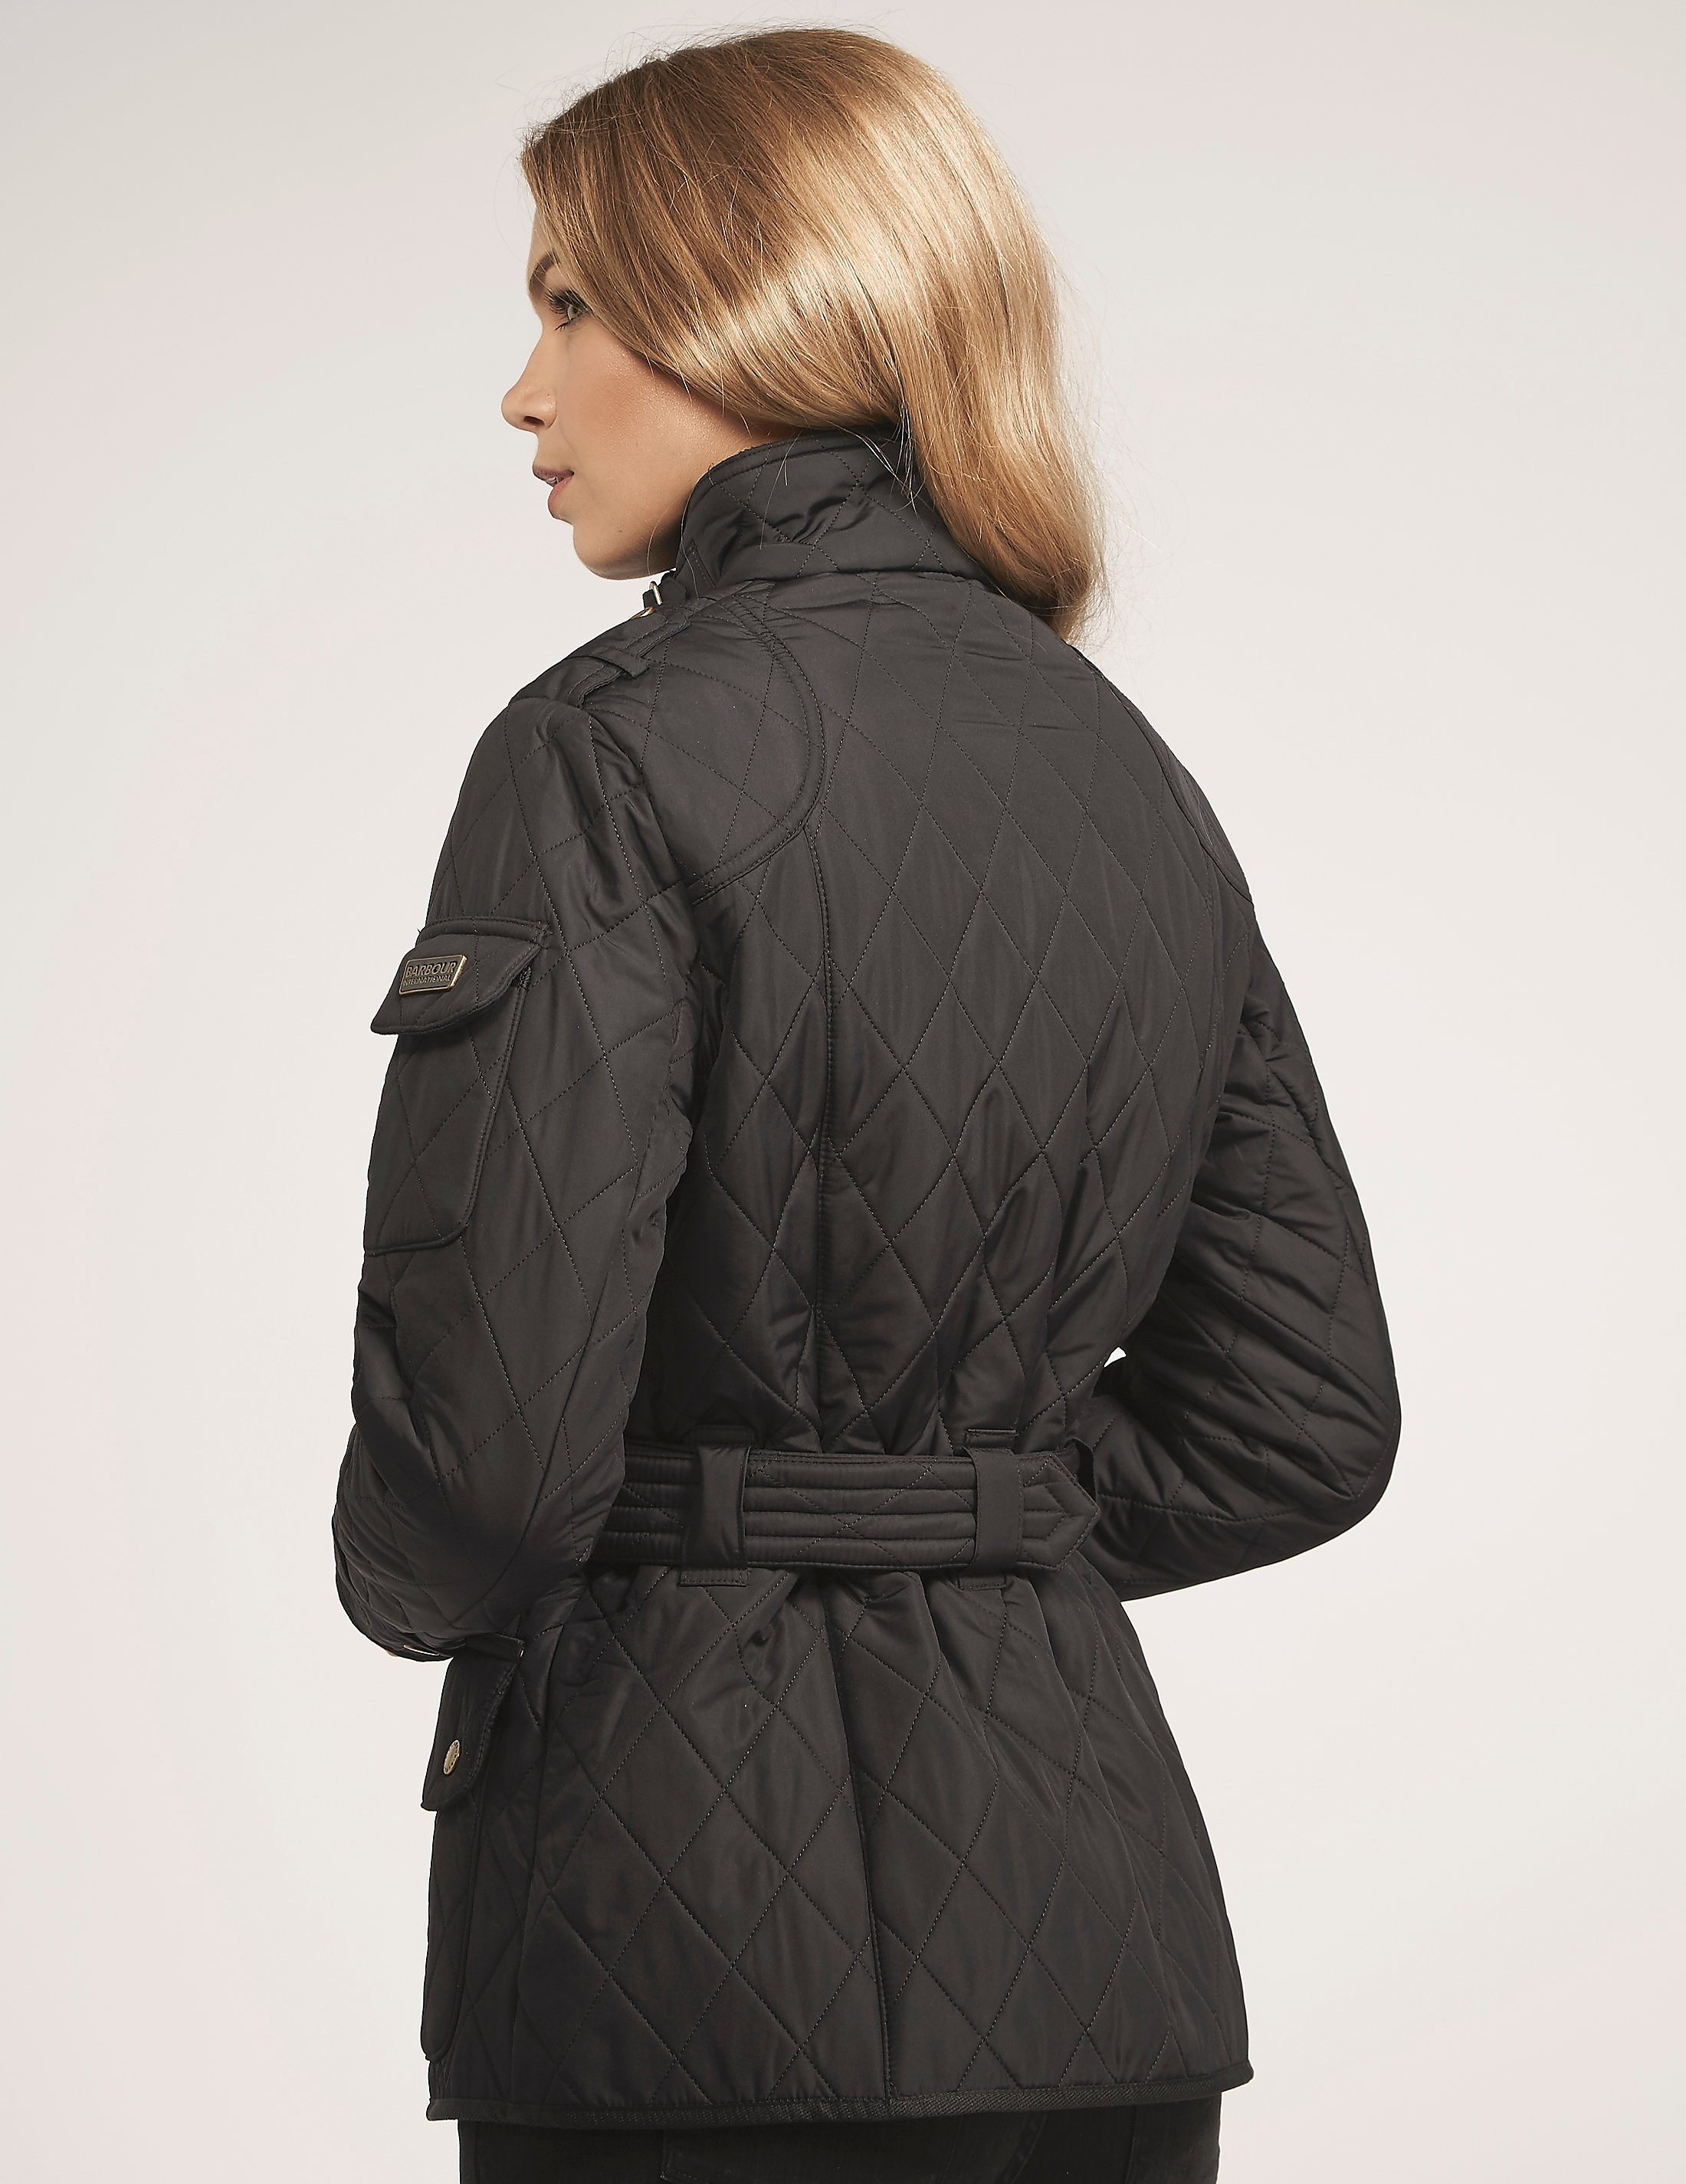 Barbour Tourer International Quilted Coat